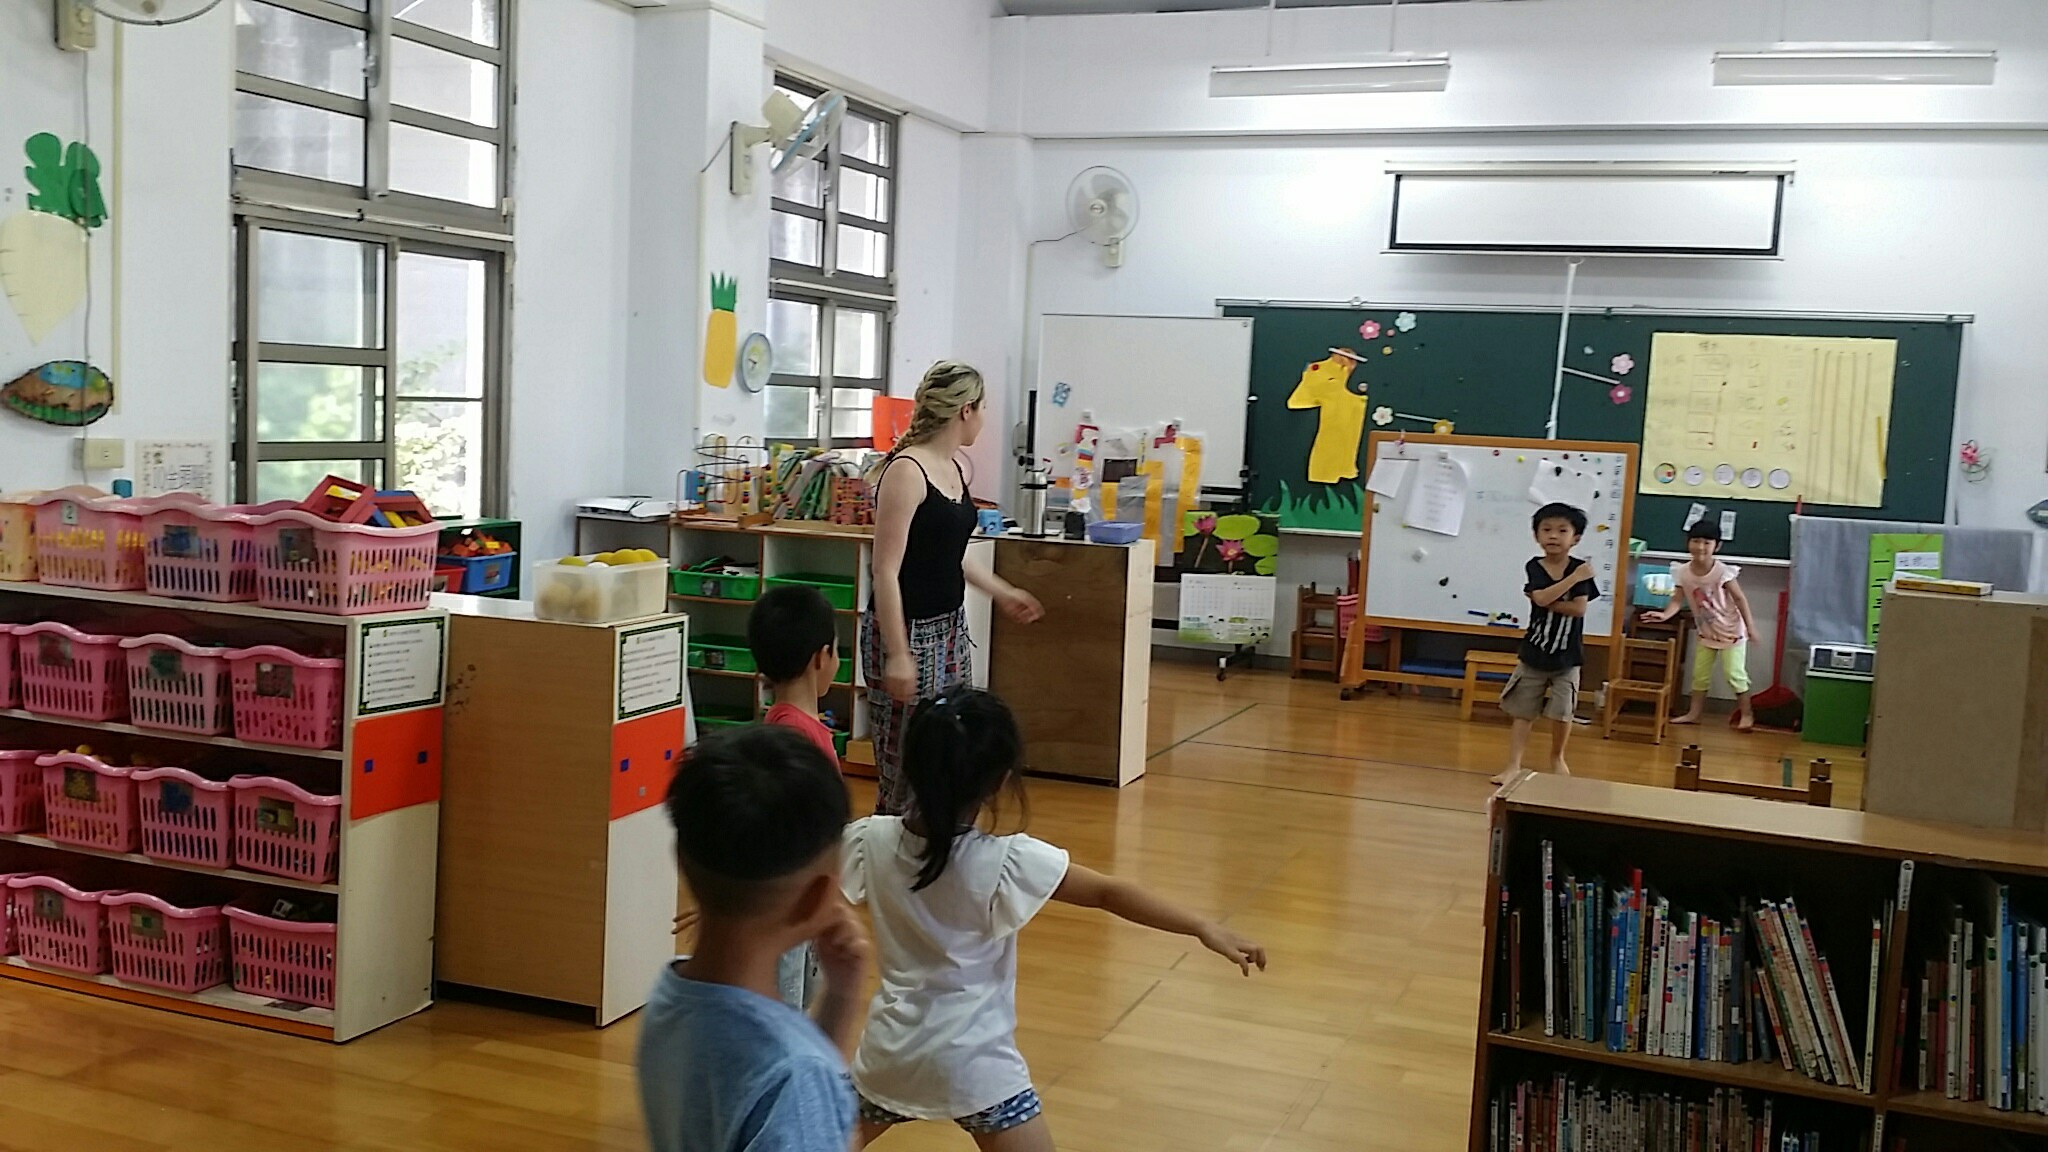 http://www.tses.cyc.edu.tw/uploads/tadgallery/2017_06_30/3844_國際志工幼兒園_170630_0004.jpg